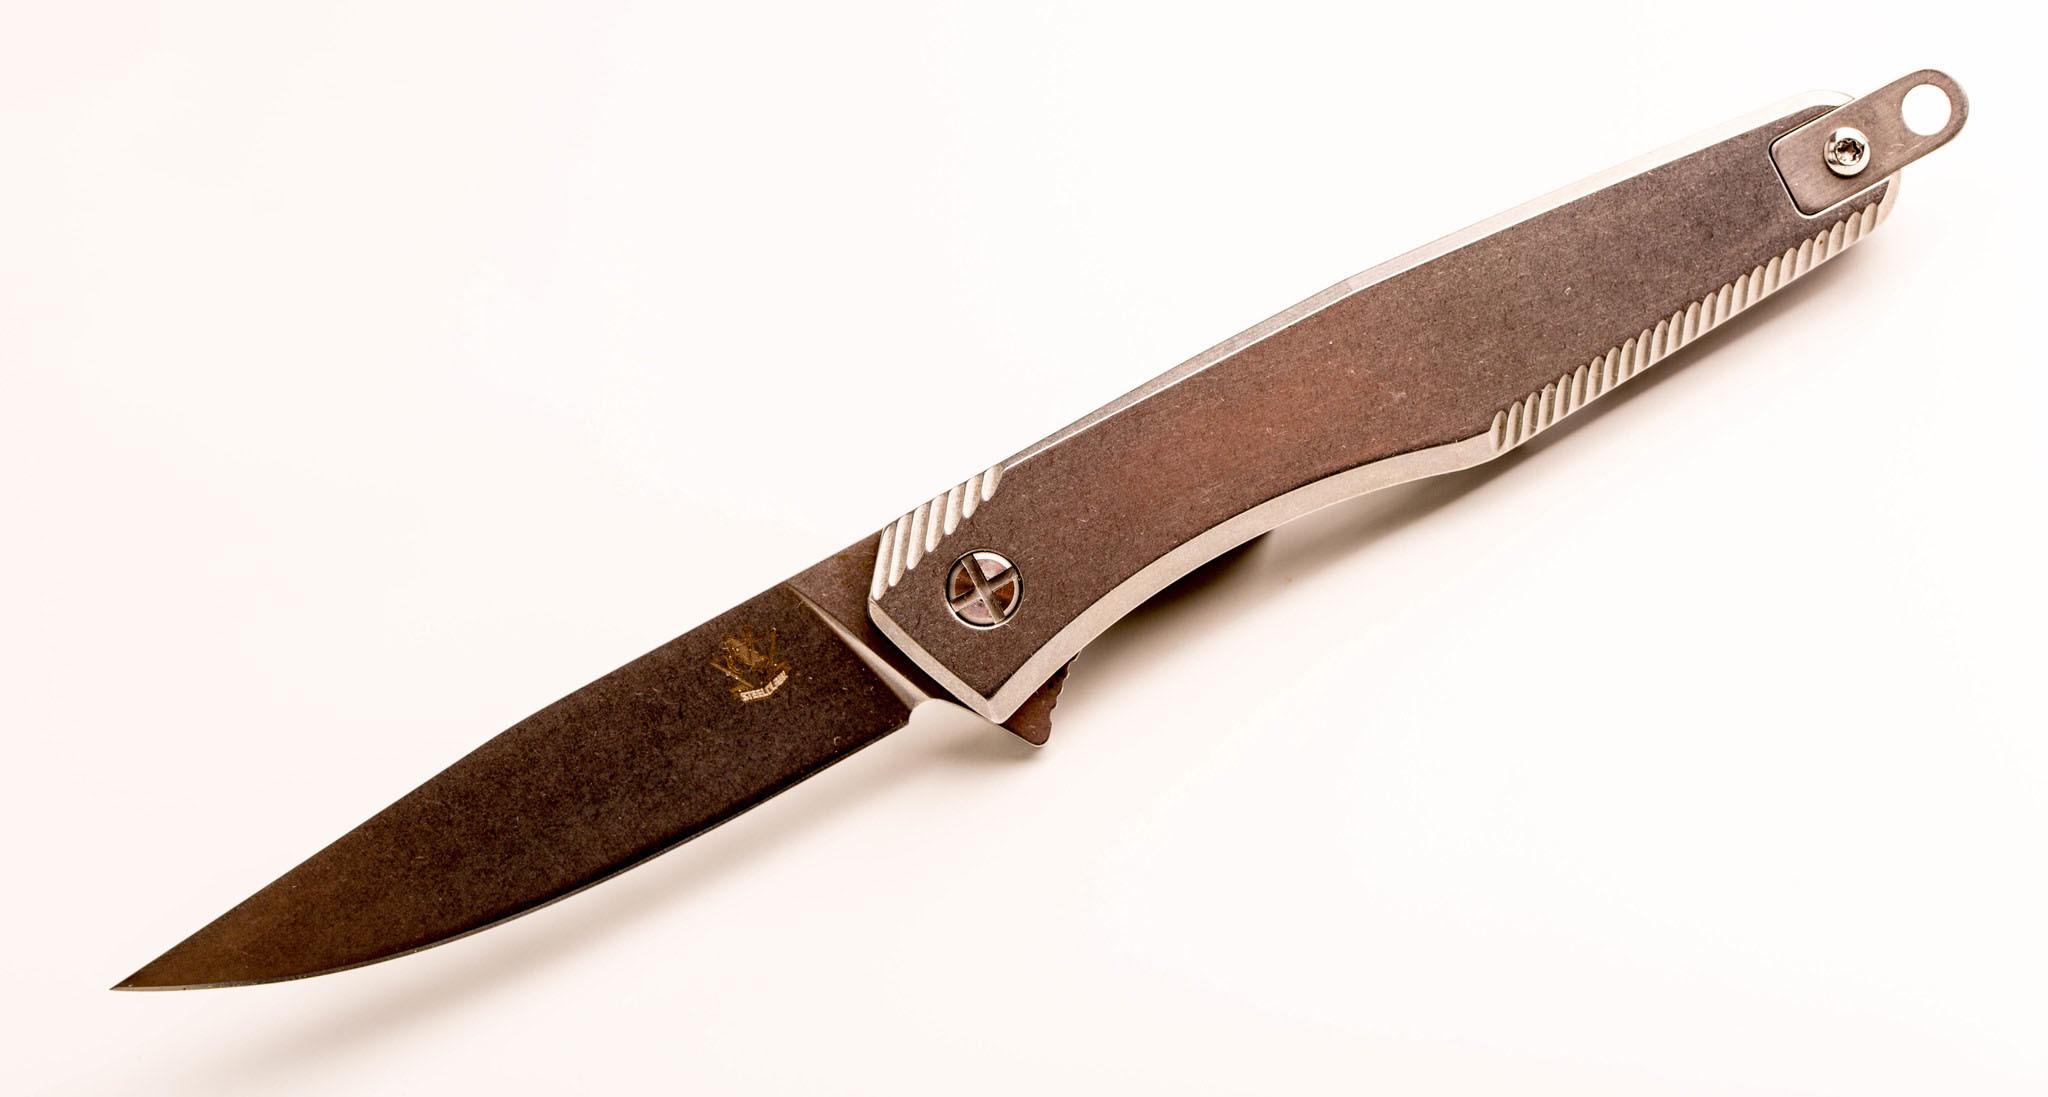 Складной нож СЭР1, сталь AUS-8 от Steelclaw